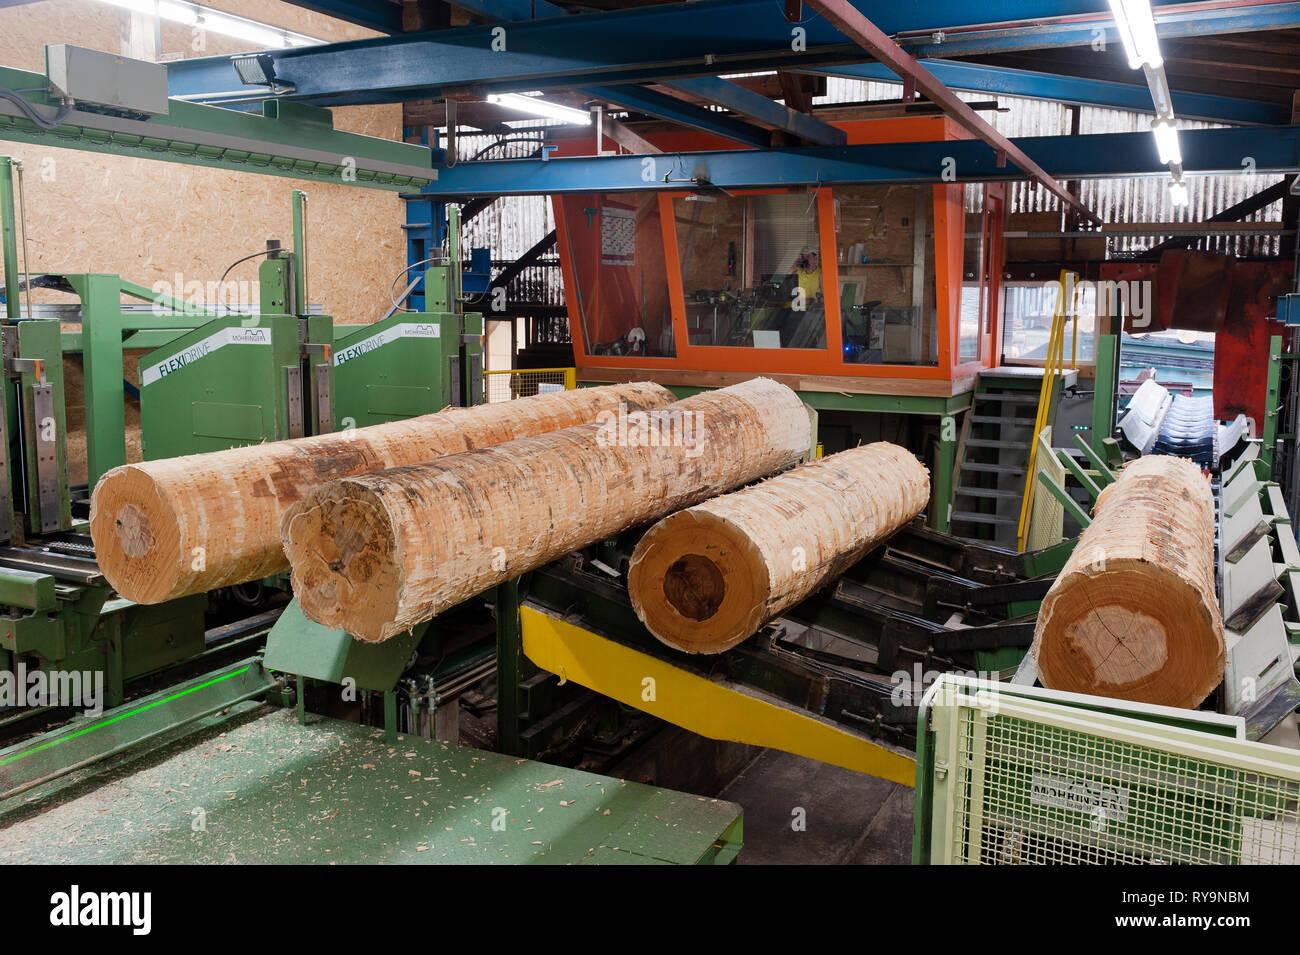 Logs on conveyor belt at lumber factory - Stock Image